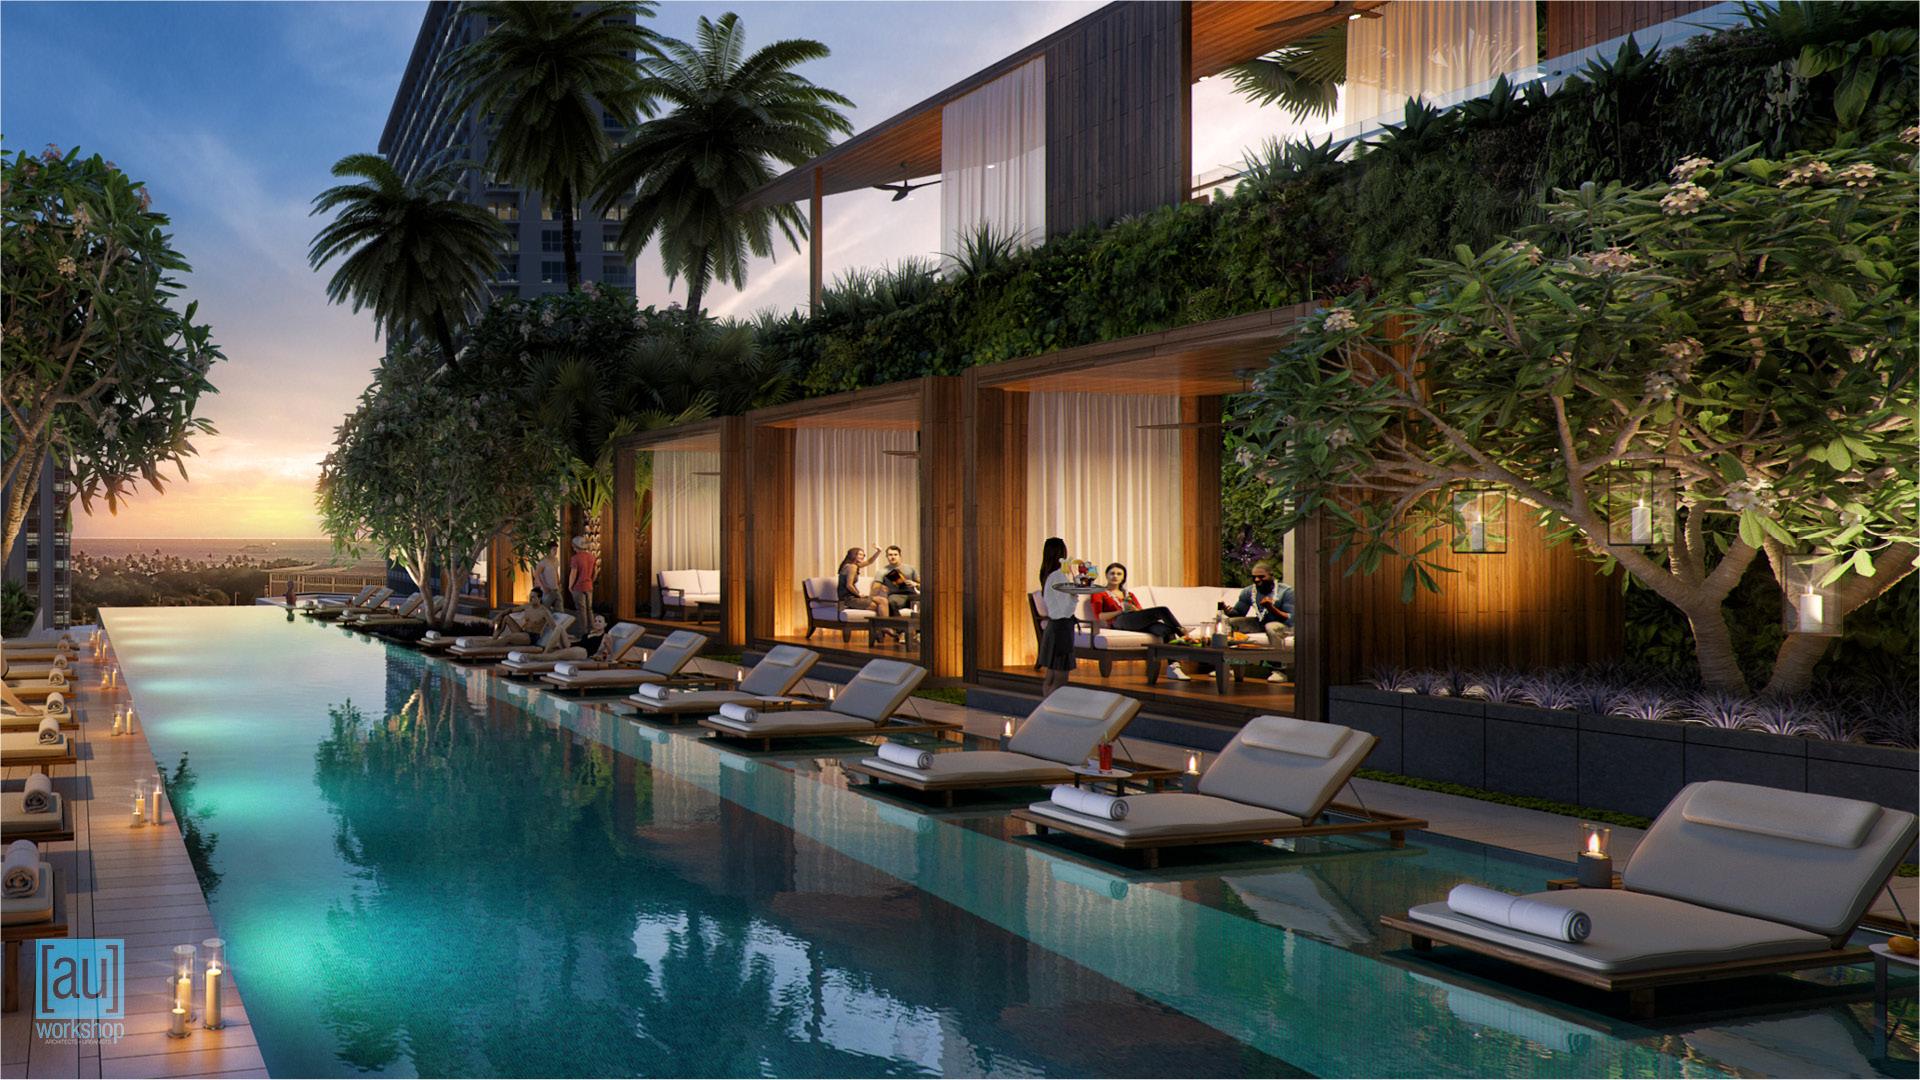 Hotel Pool Cabanas